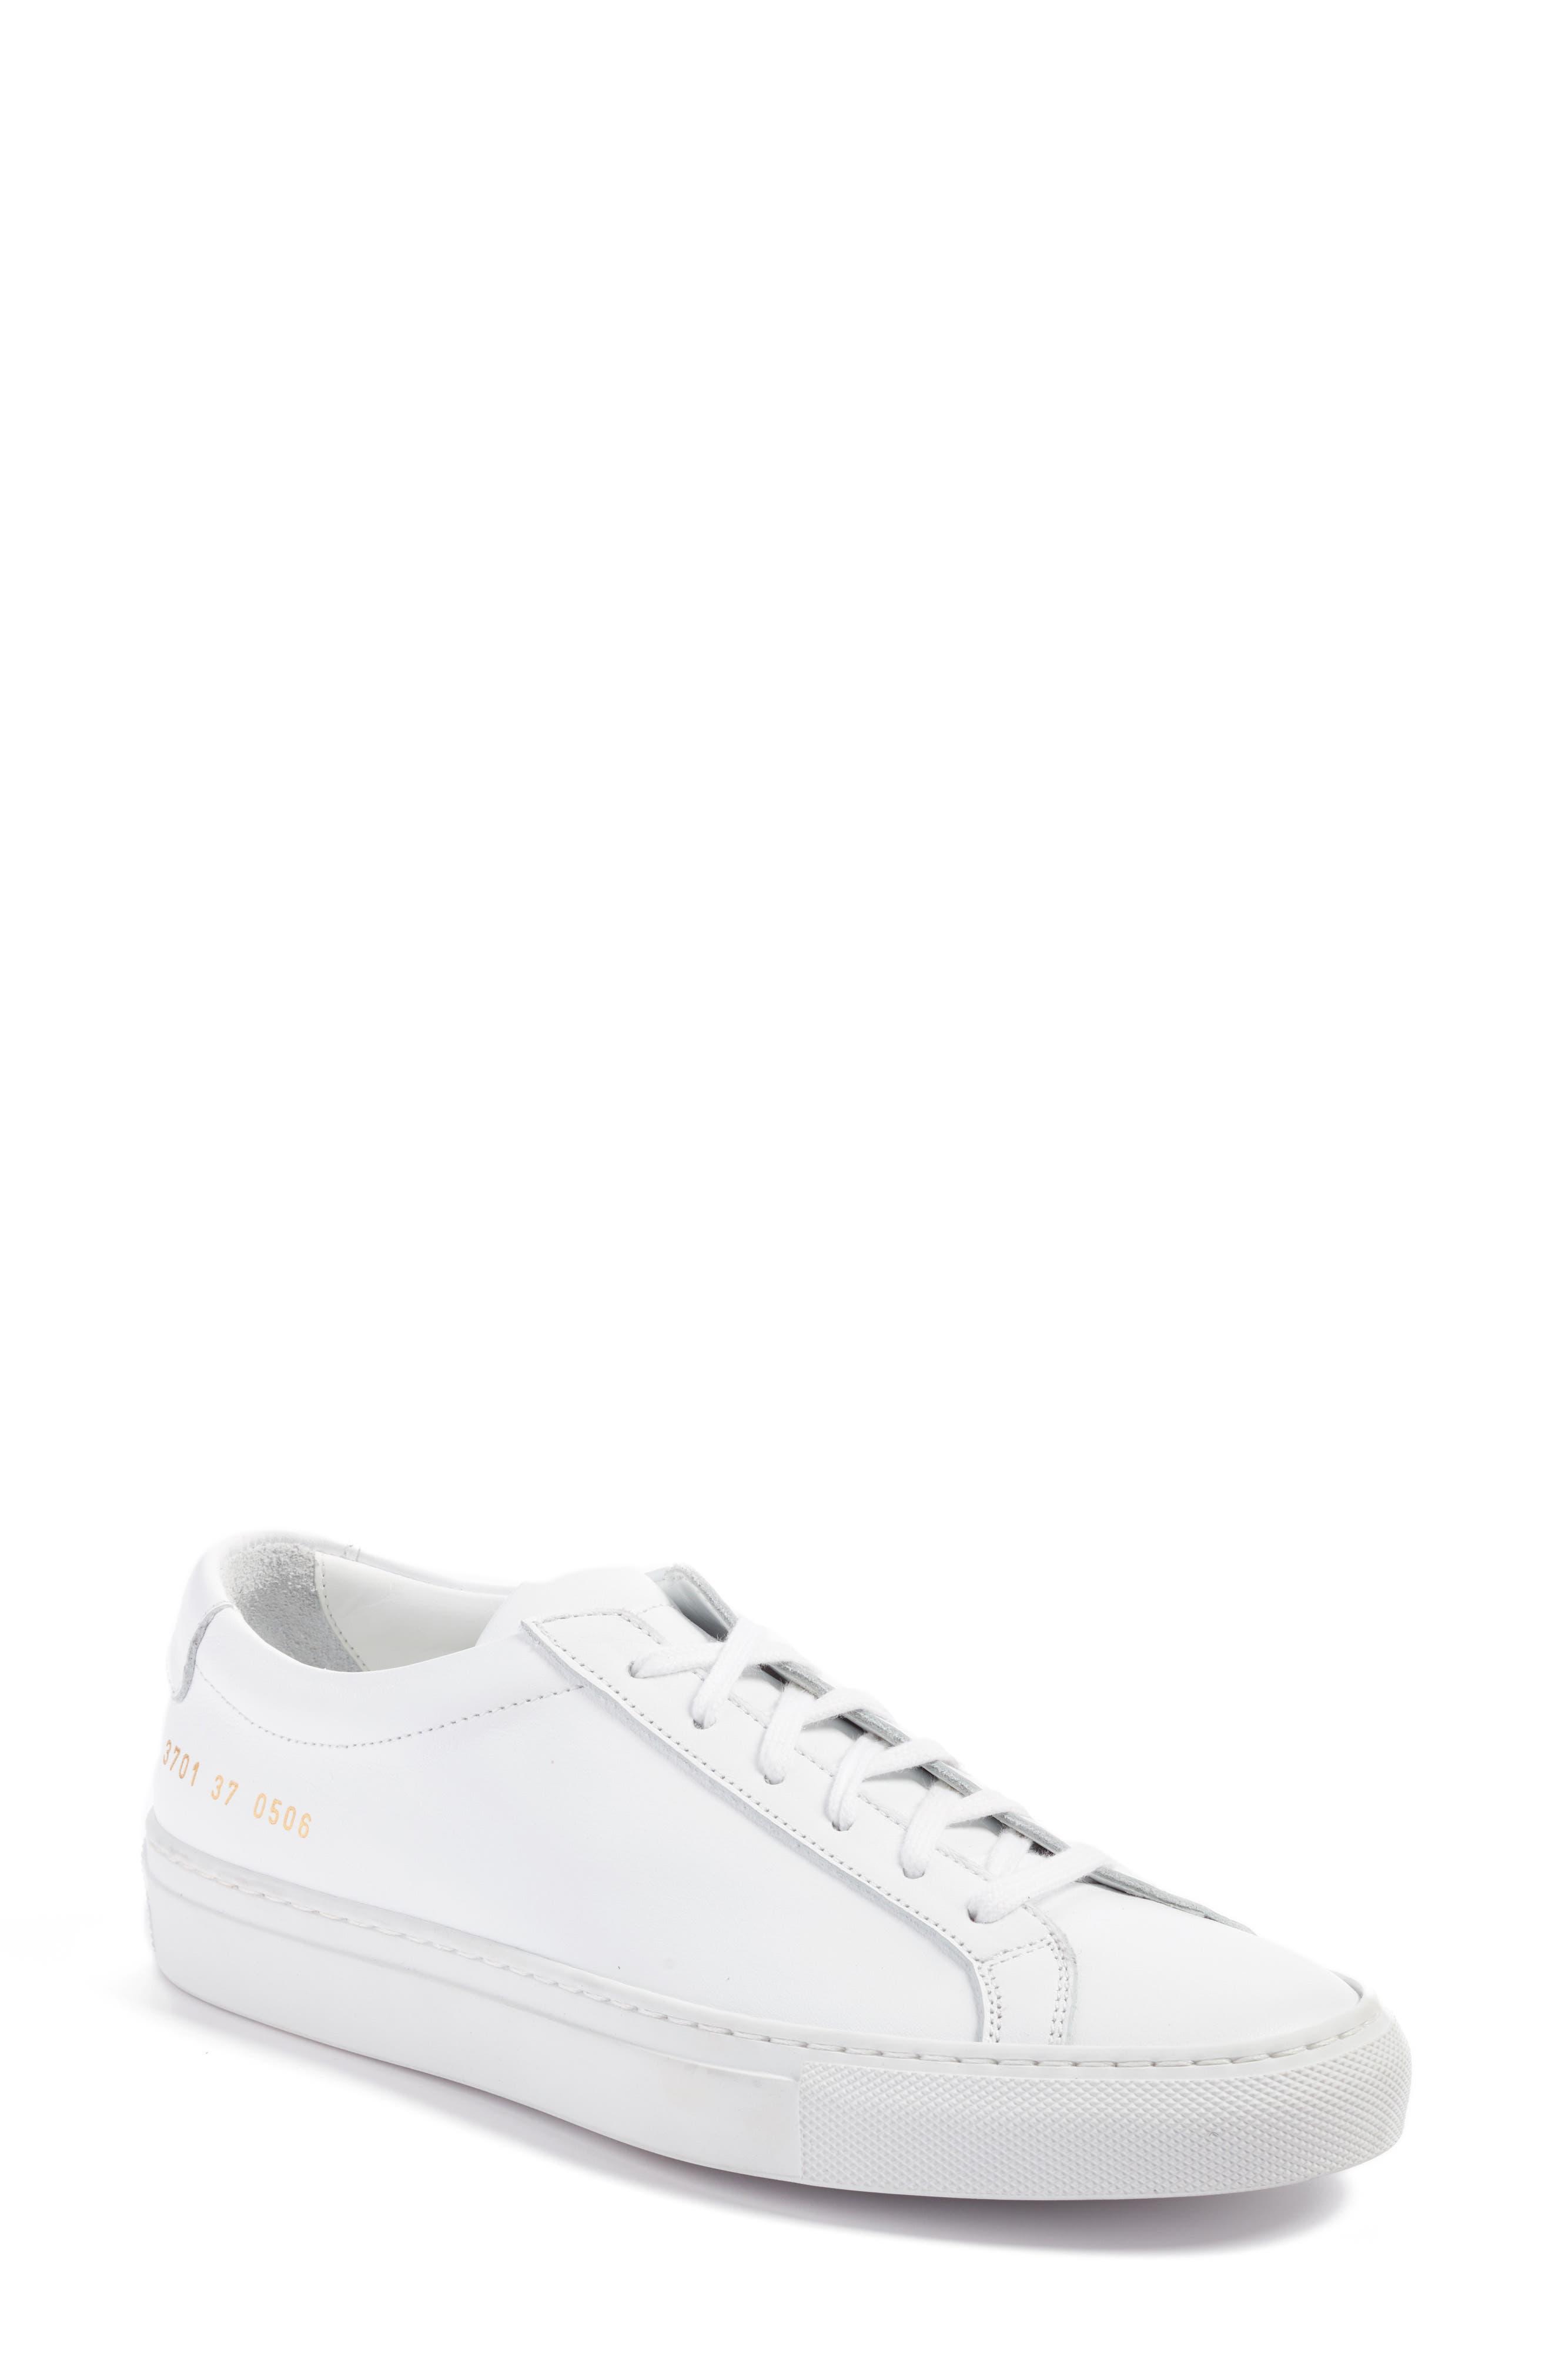 COMMON PROJECTS, Original Achilles Sneaker, Main thumbnail 1, color, WHITE LEATHER